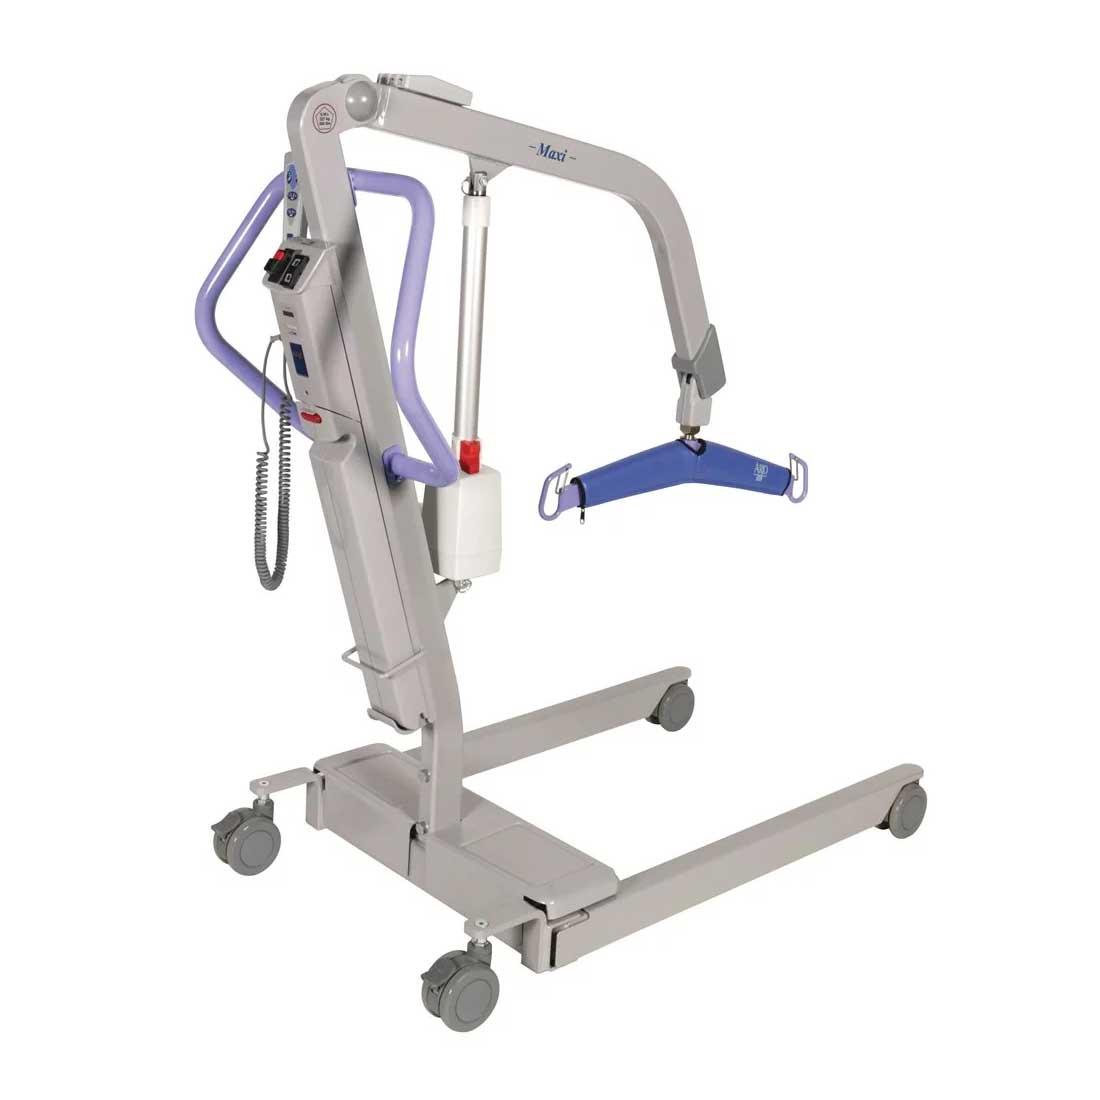 Arjo Maxi 500 power patient lift